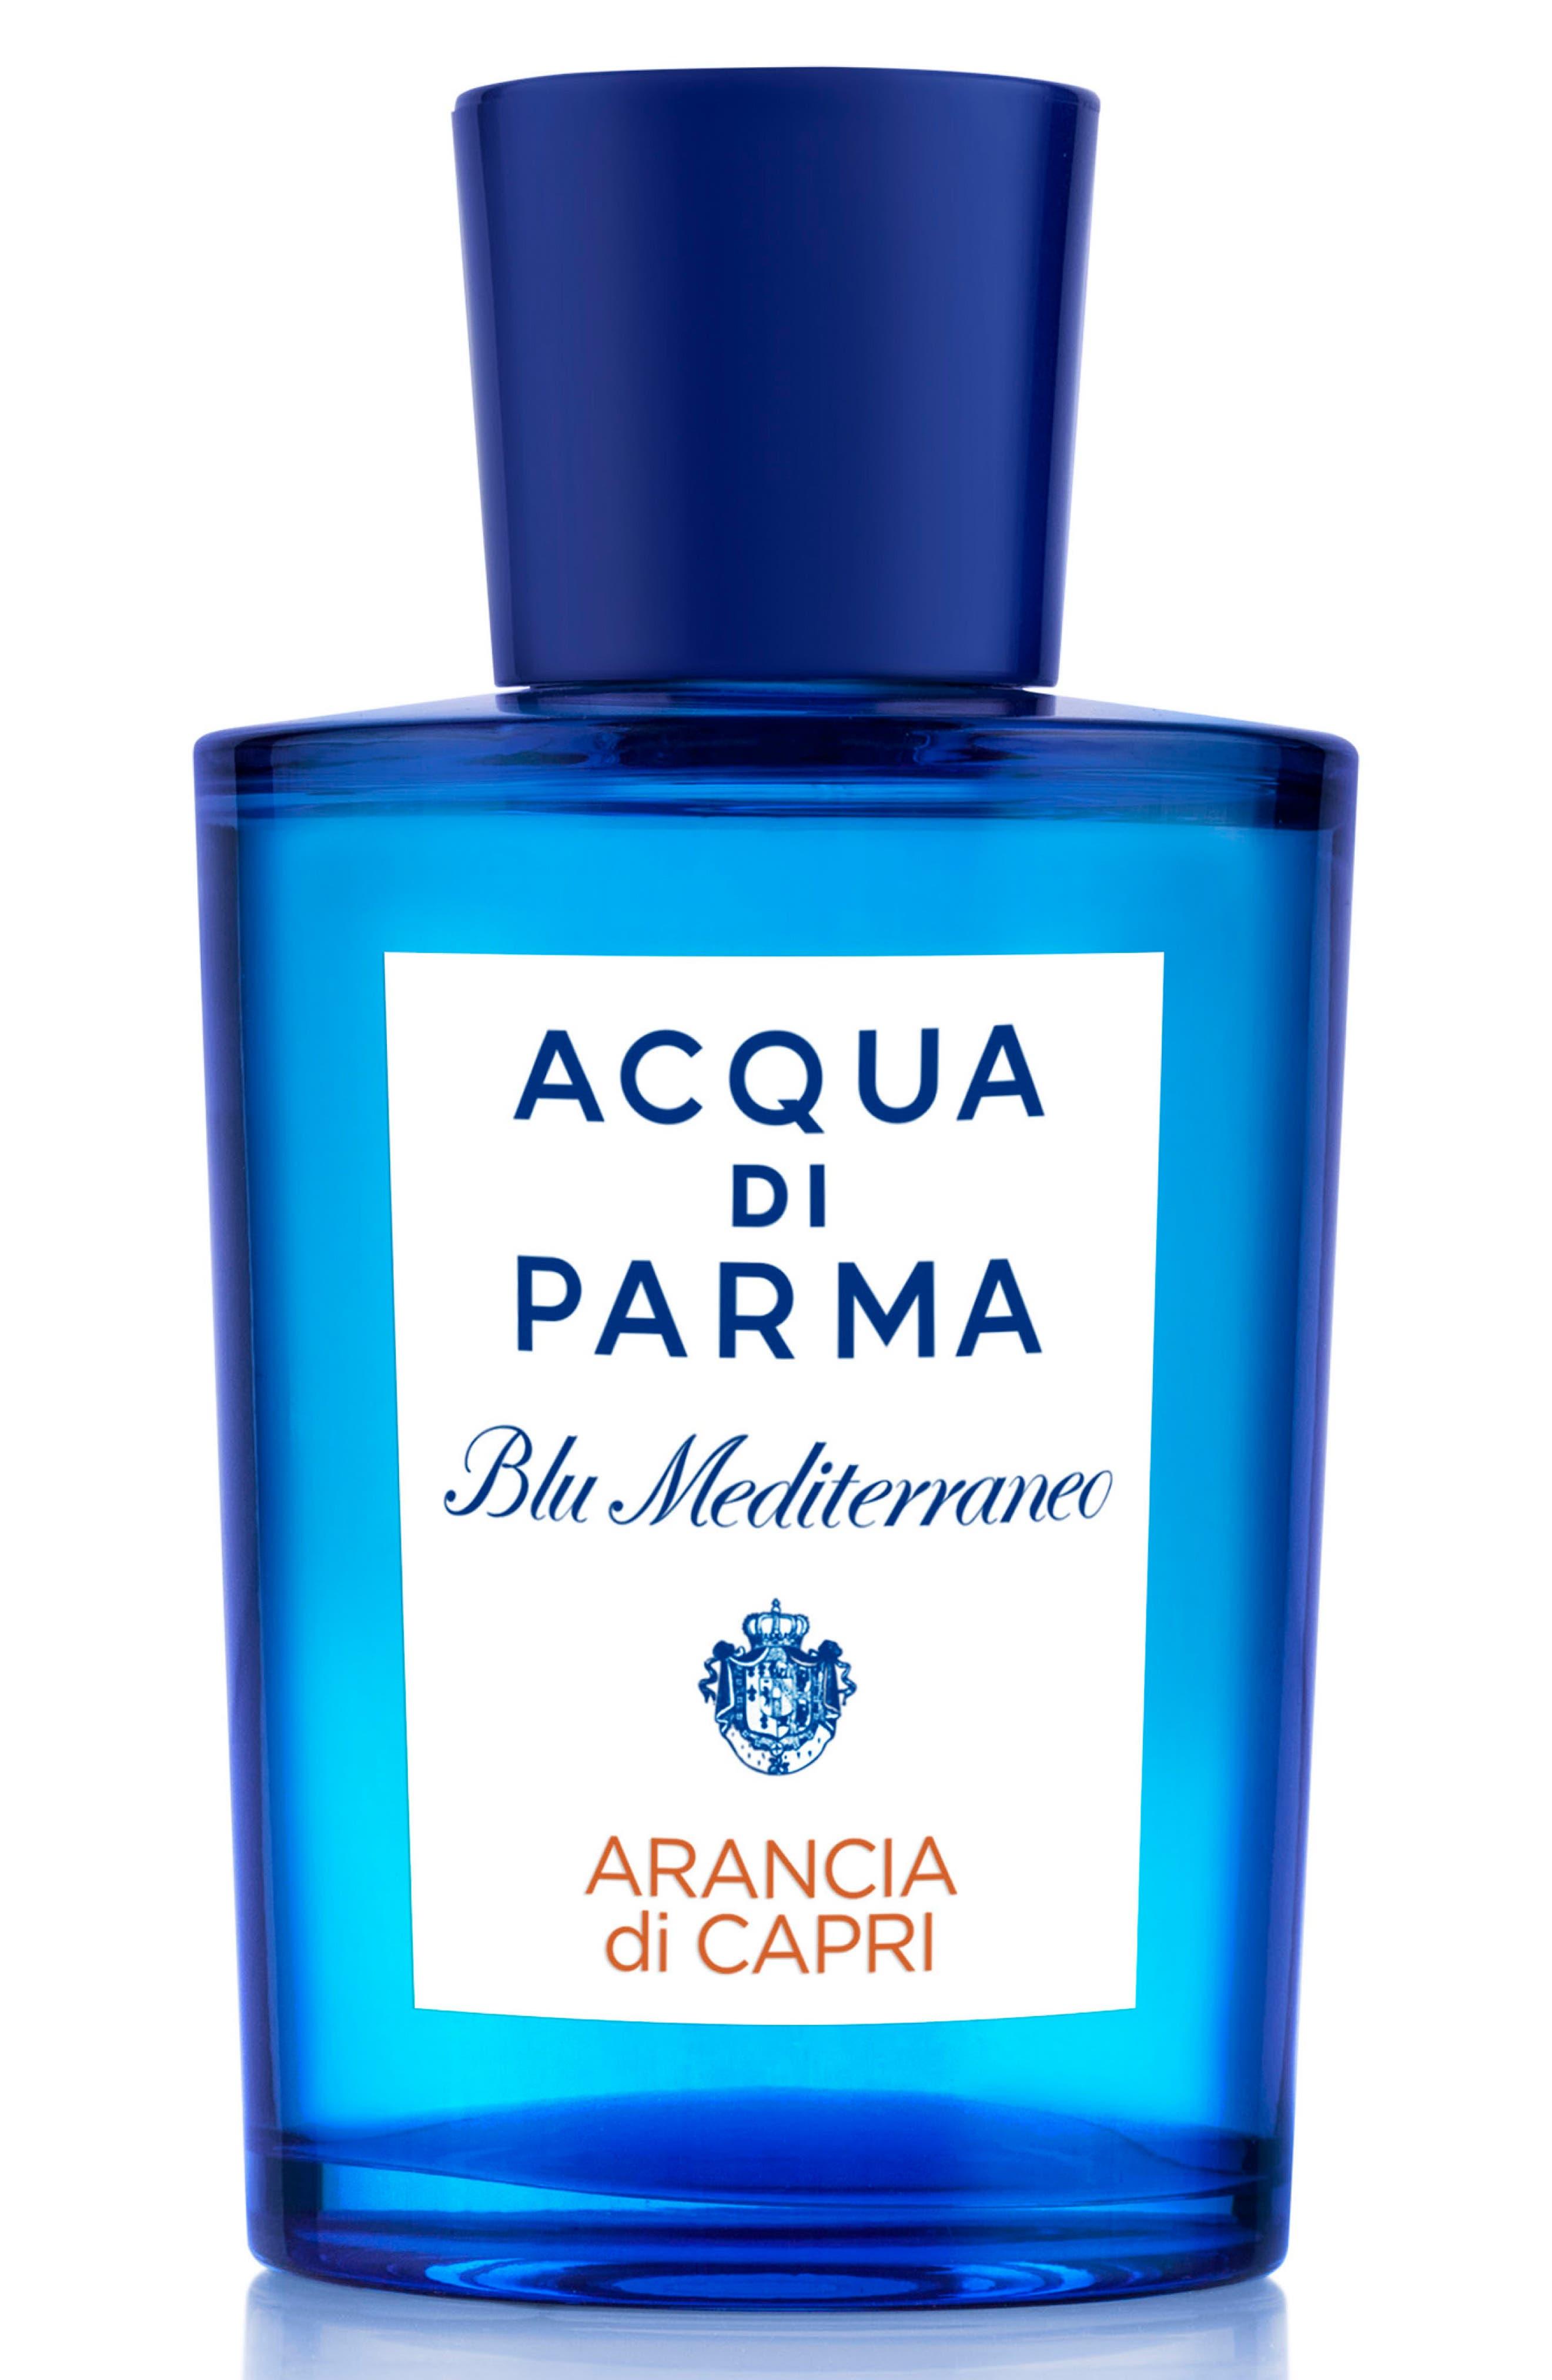 ACQUA DI PARMA Blu Mediterraneo Arancia di Capri Eau de Toilette, Main, color, NO COLOR